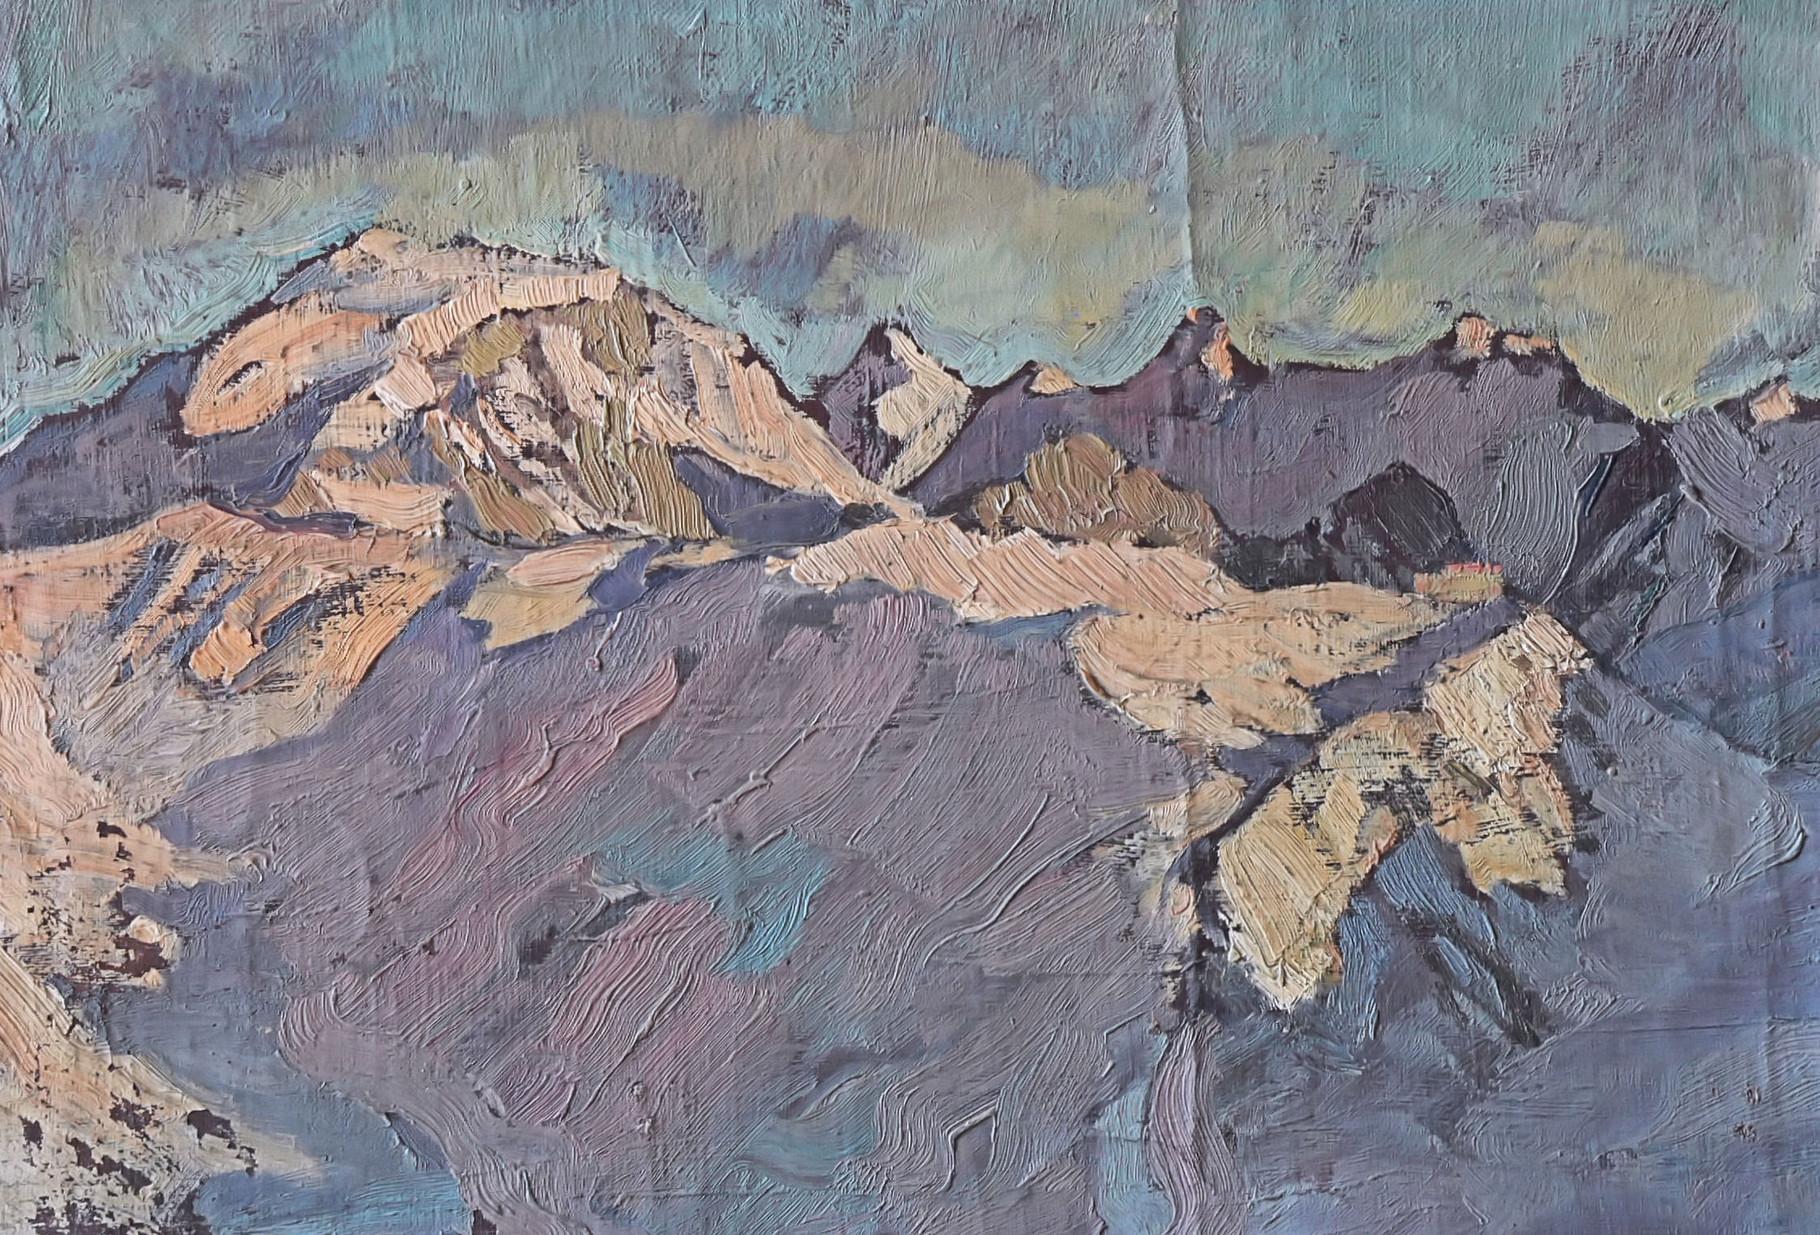 Gebirgslandschaft im Winter, um 1920